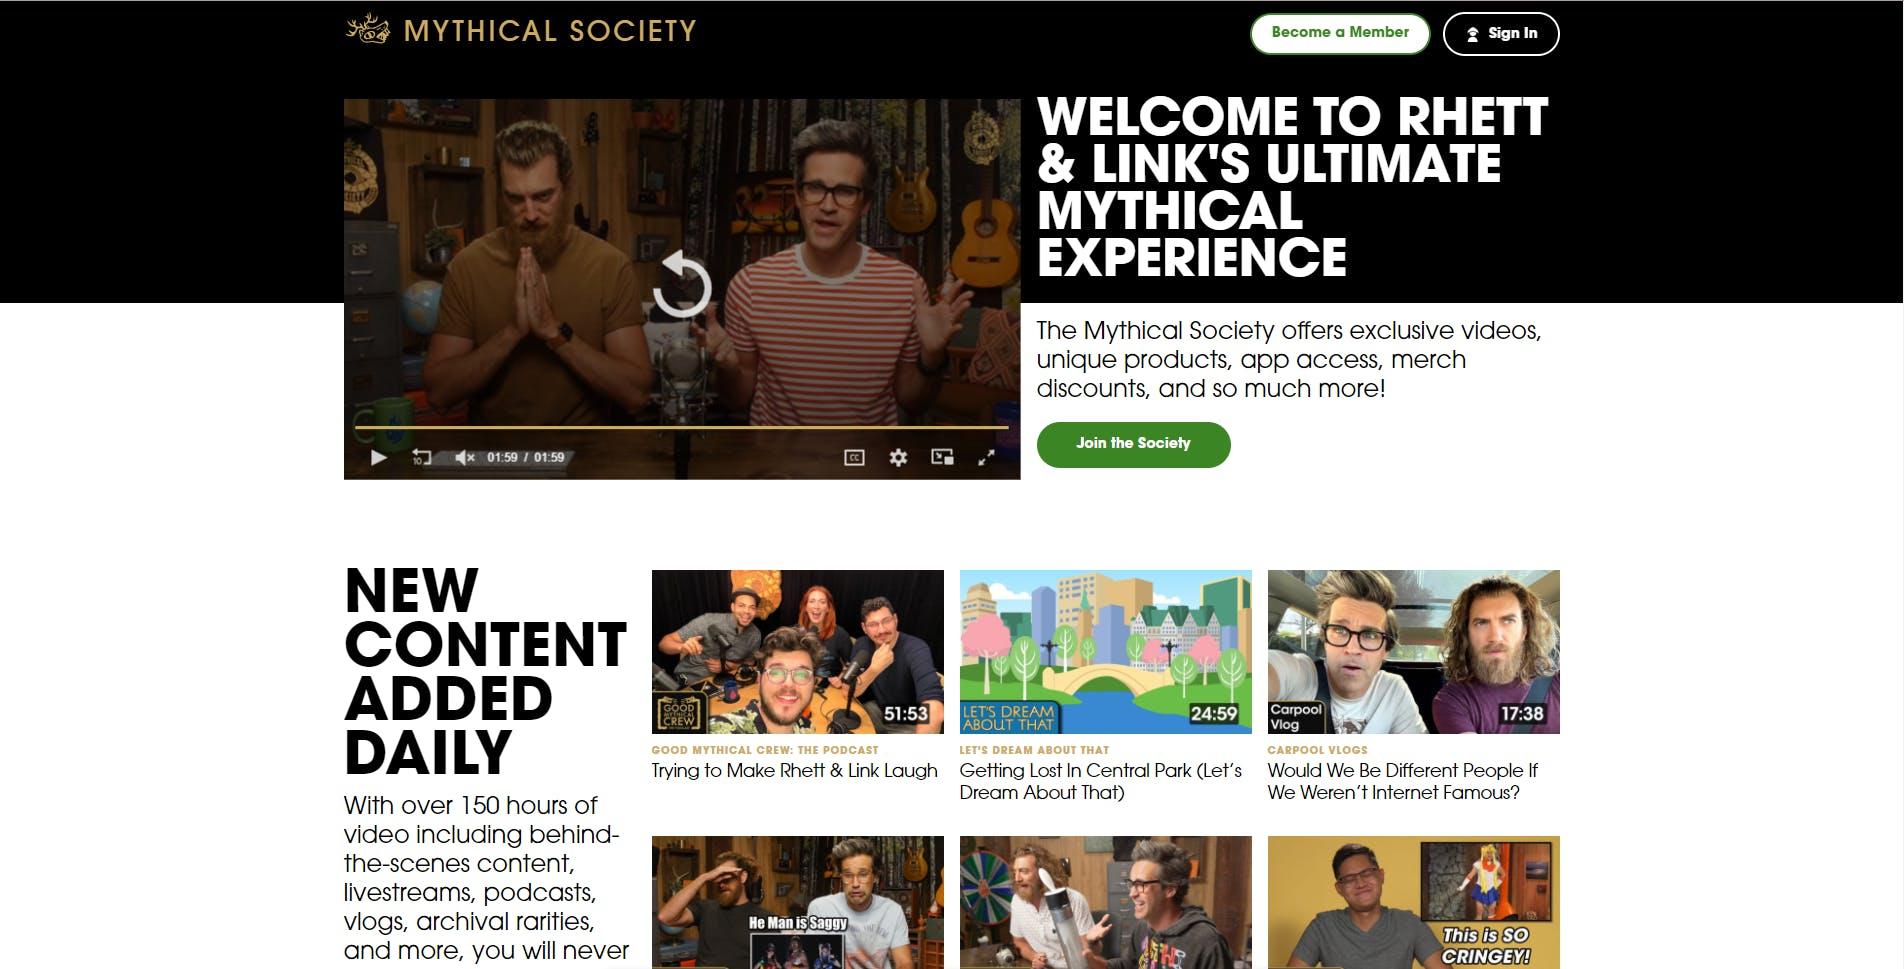 Mythical society website screenshot